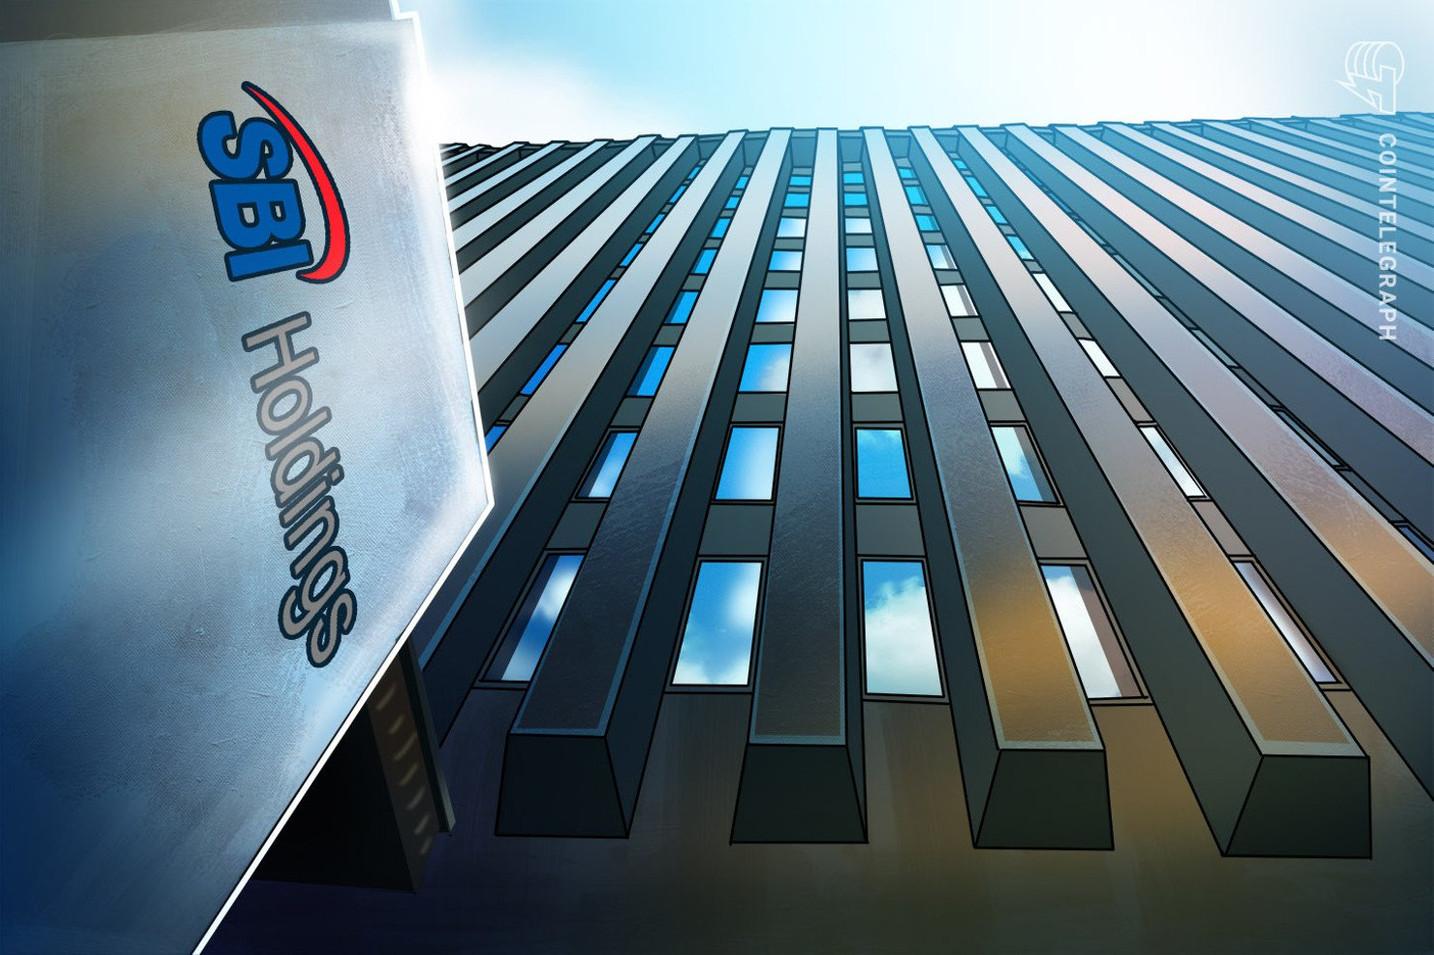 SBIVCトレードが貸仮想通貨サービスを開始